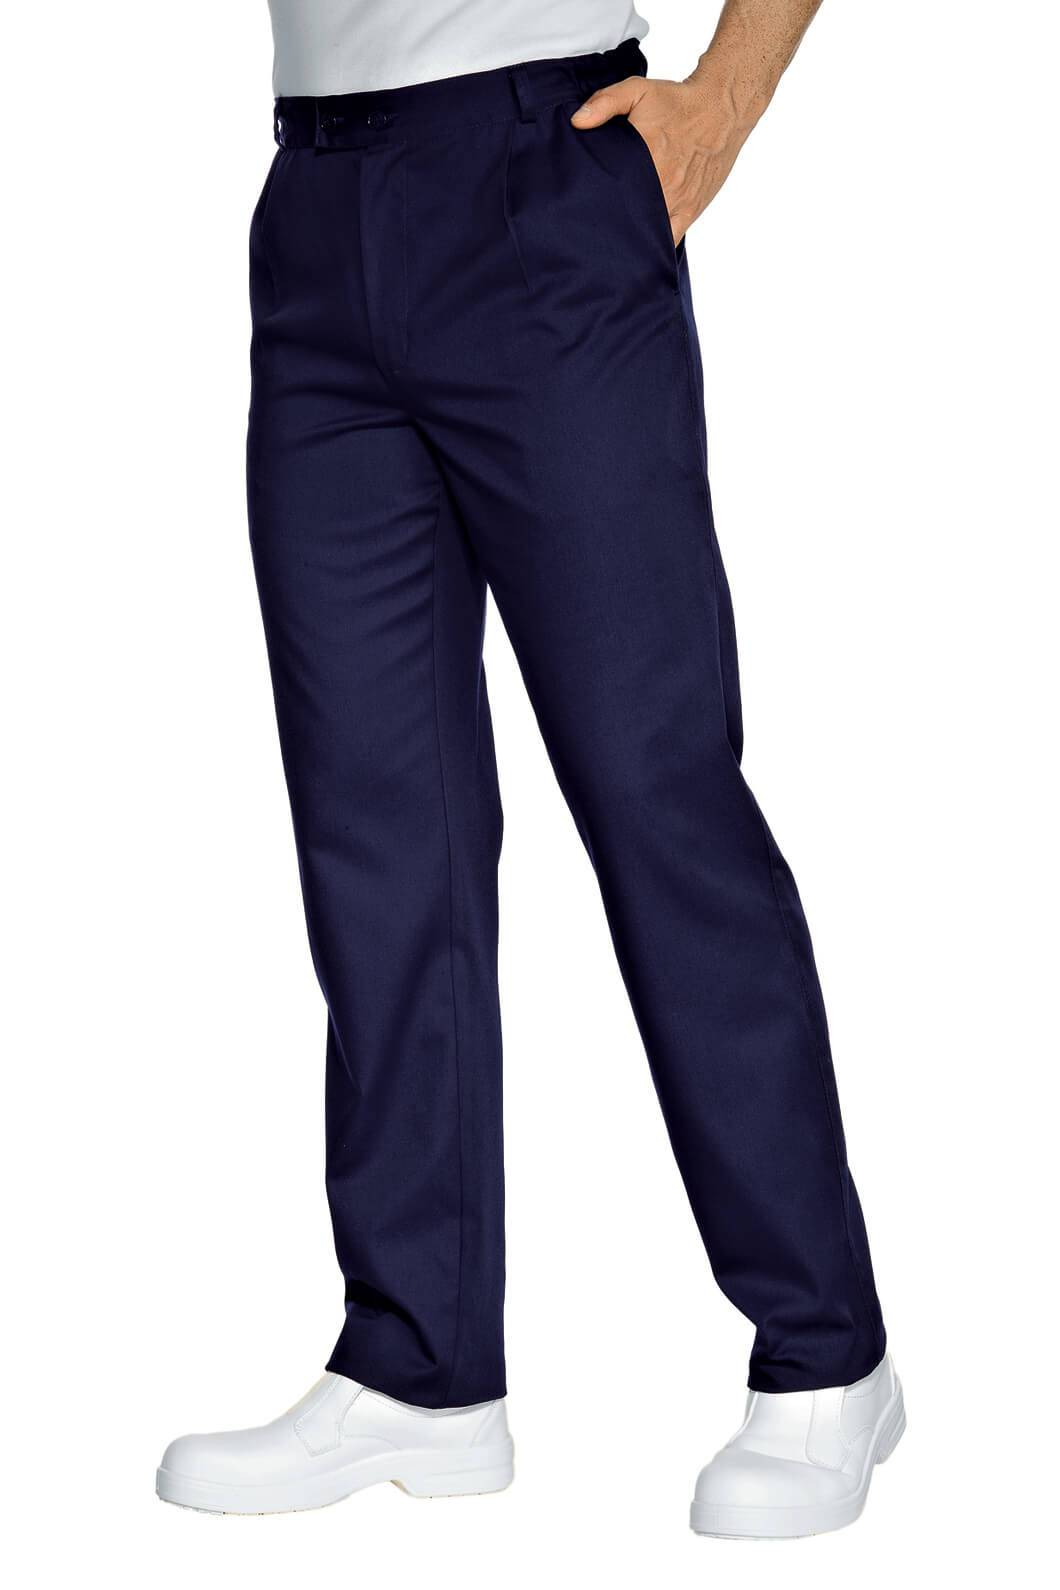 ISACCO Pantalon Chef Cuisinier Bleu